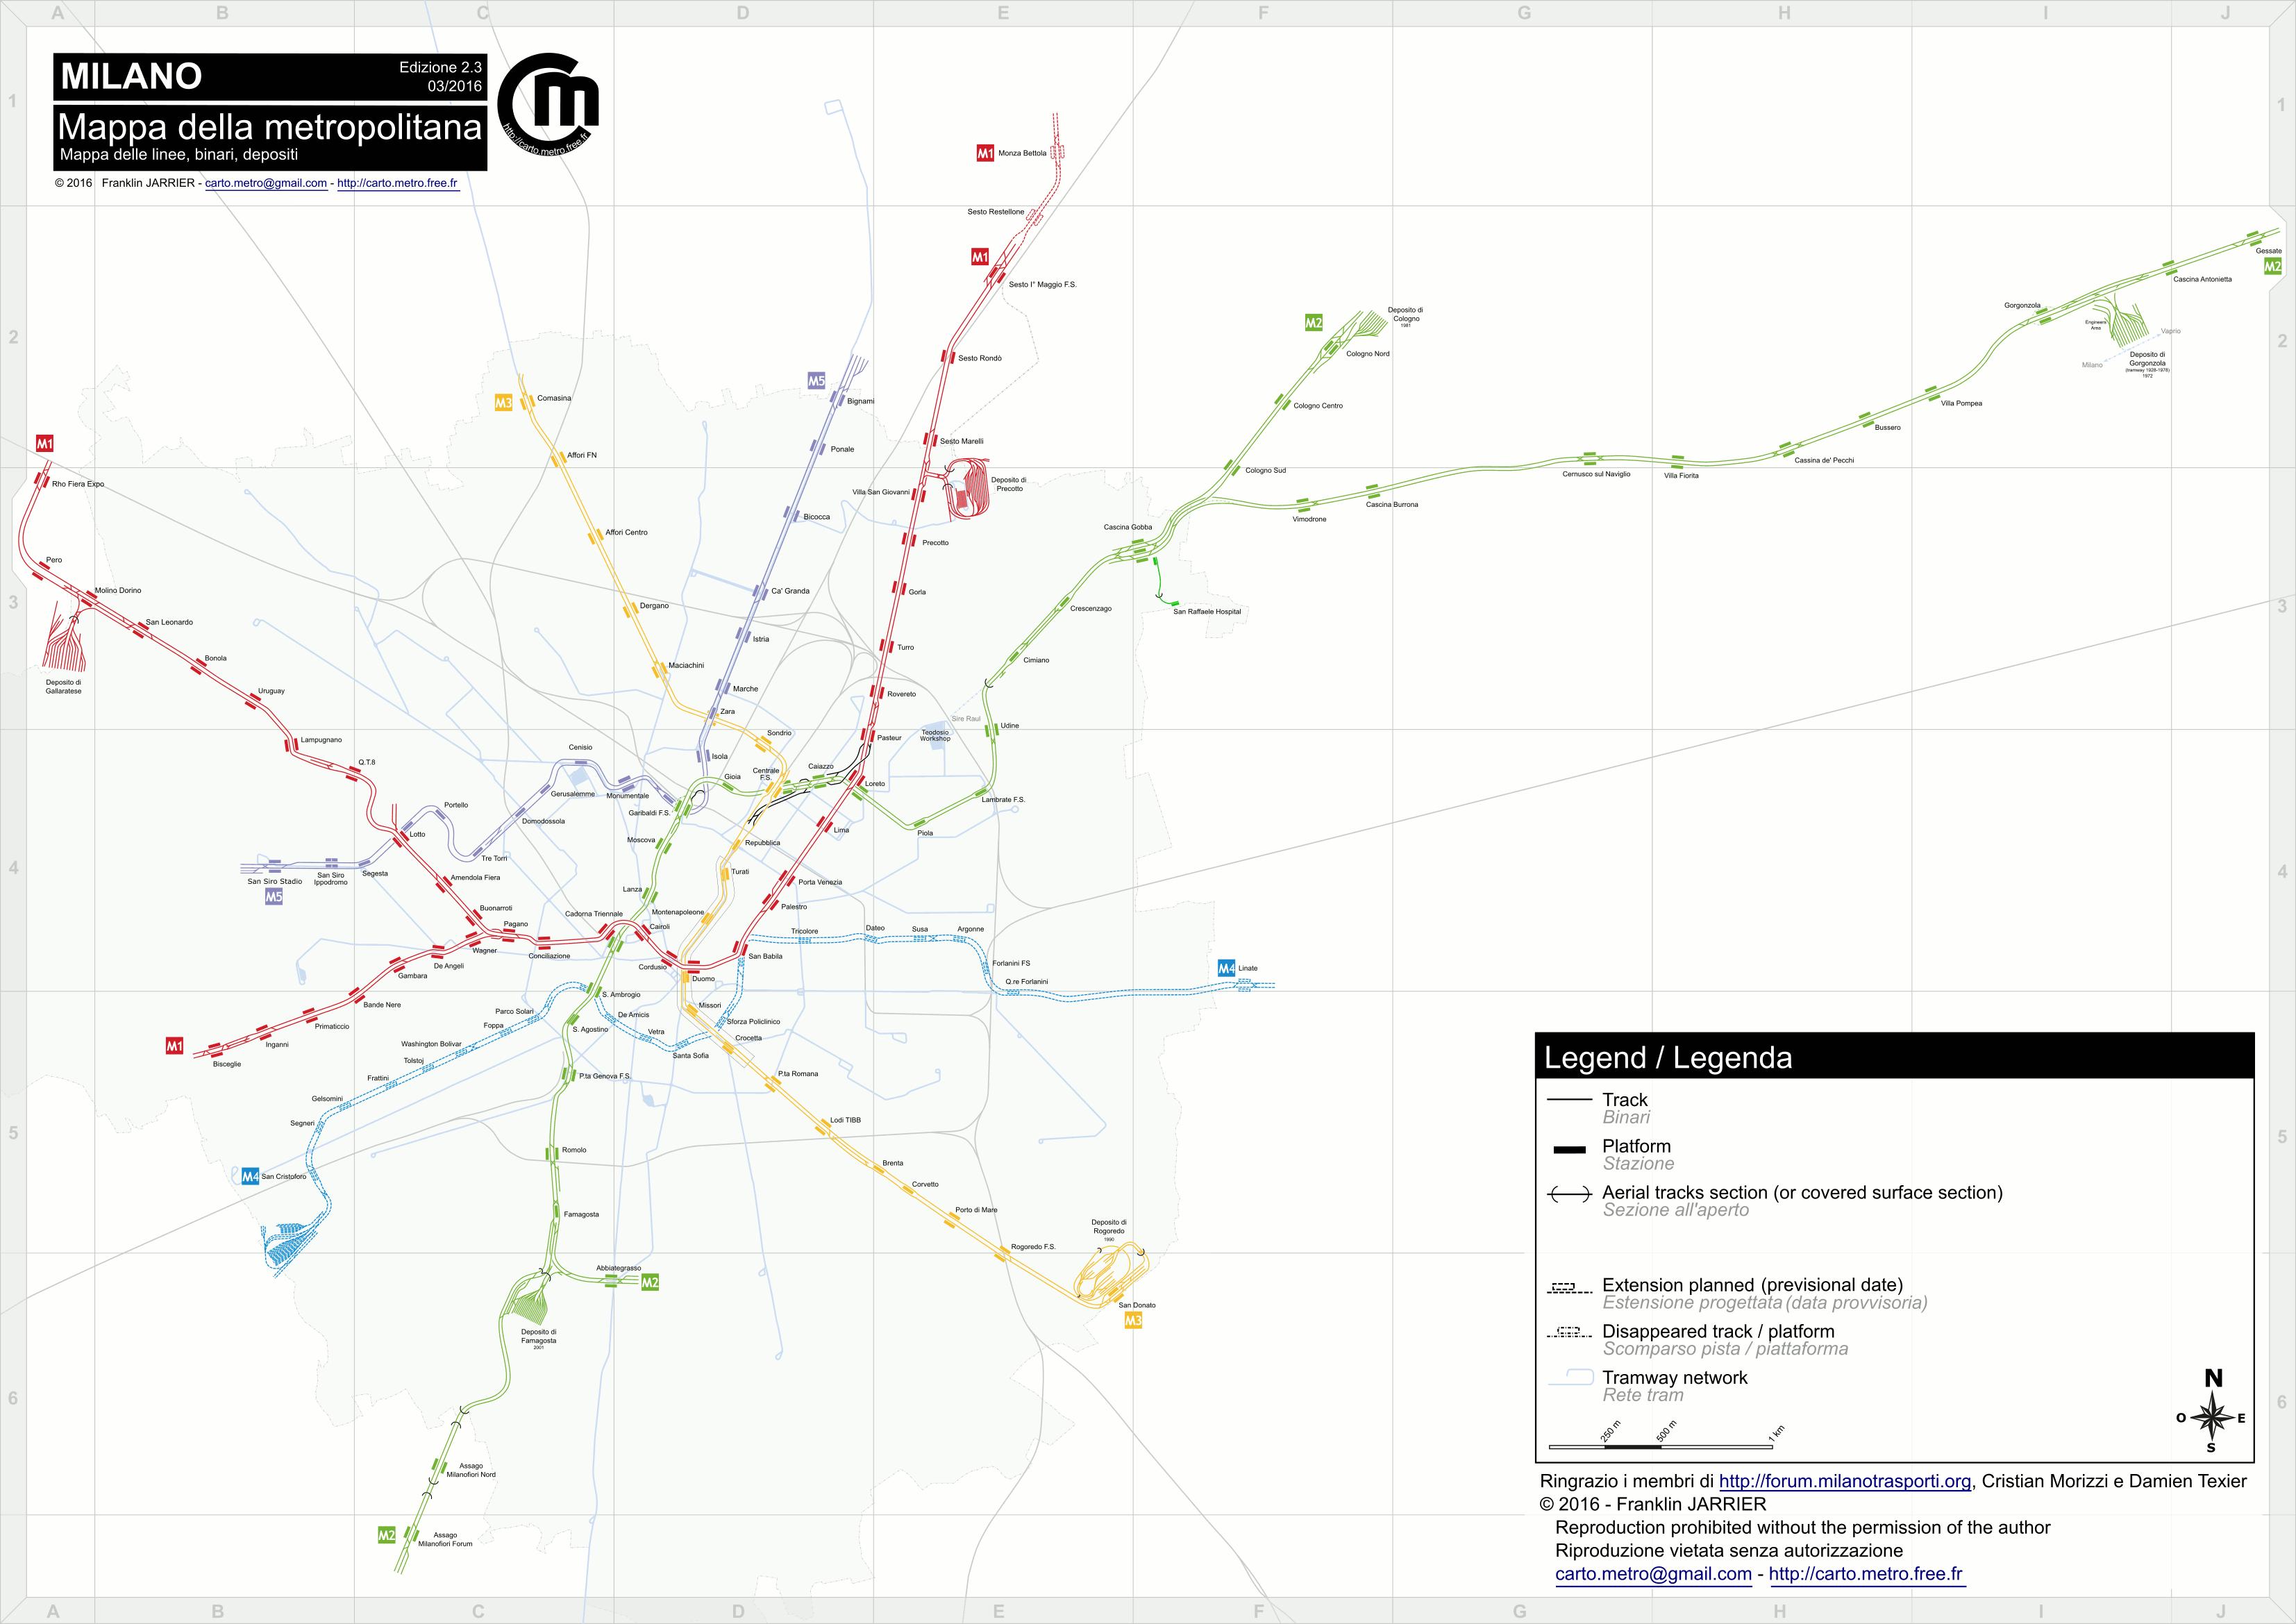 Subway Map Of Lisbon.Detailled Tracks Map Paris Lyon Lausanne Milan Turin Tracks Maps